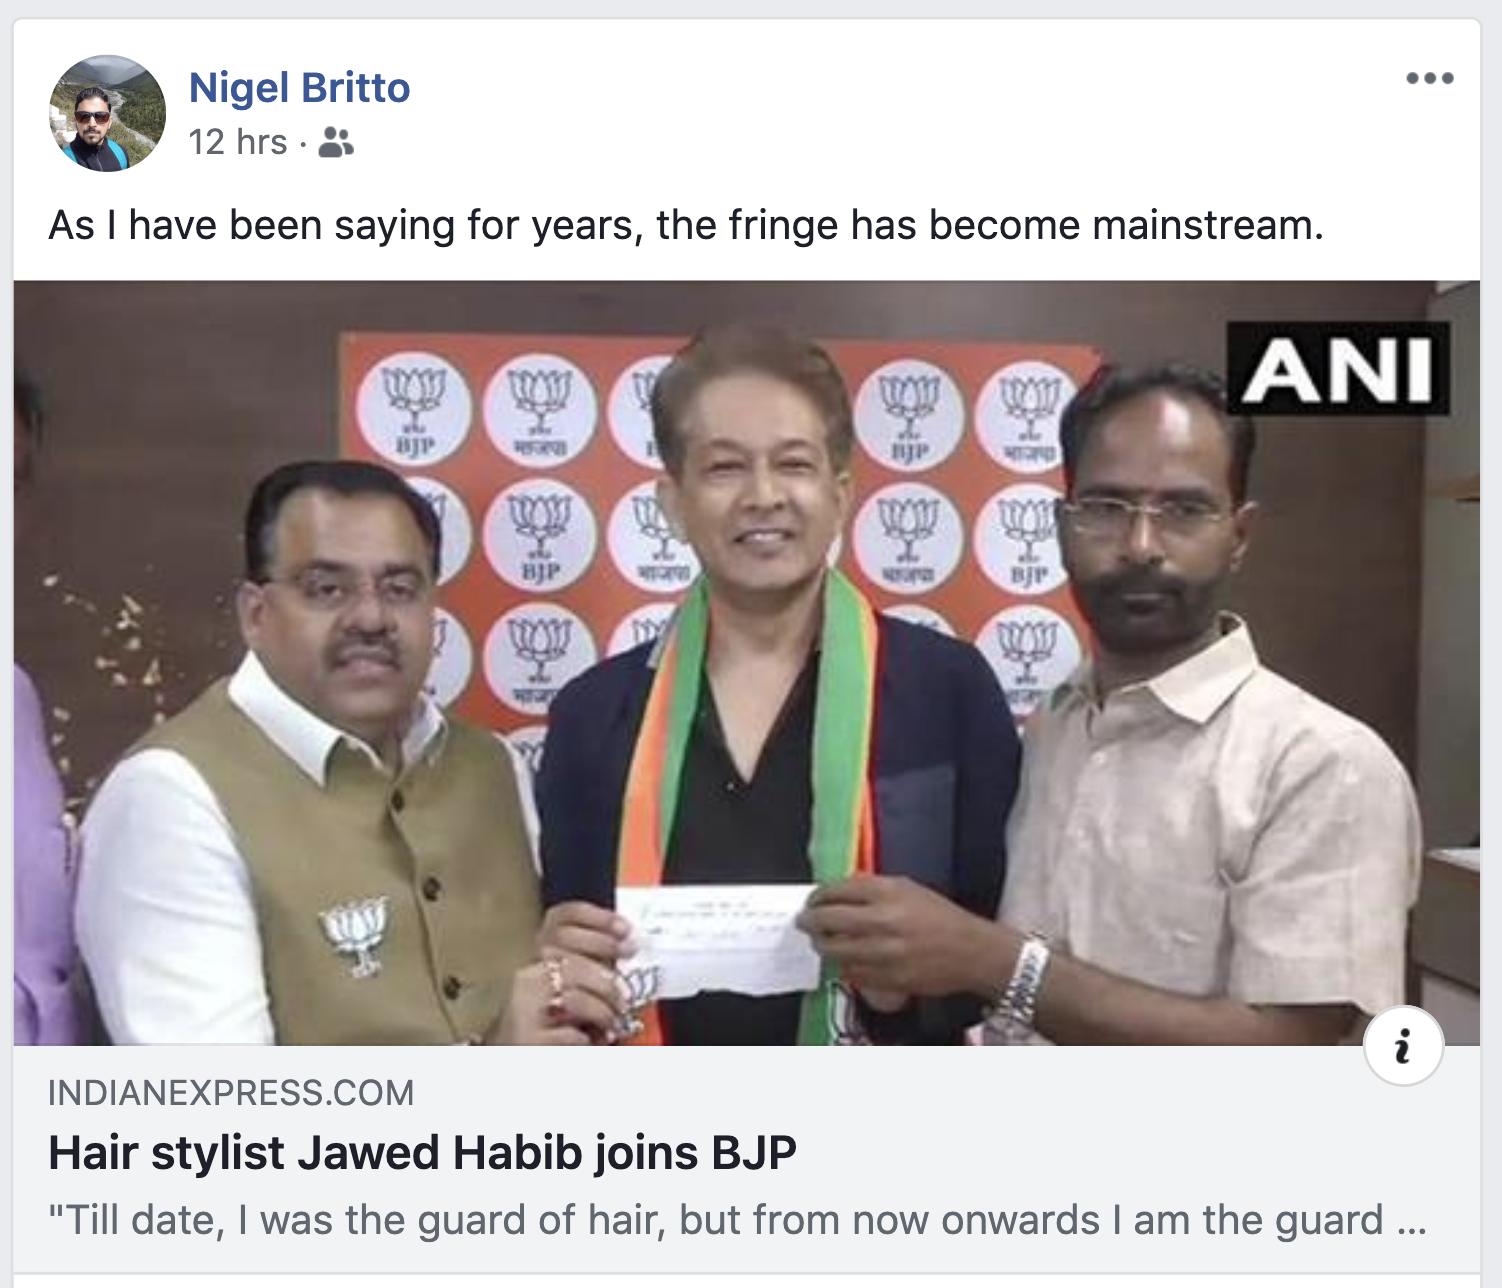 Hair Stylist Jawed Habib Joins Bjp Memes Go Viral On Social Media